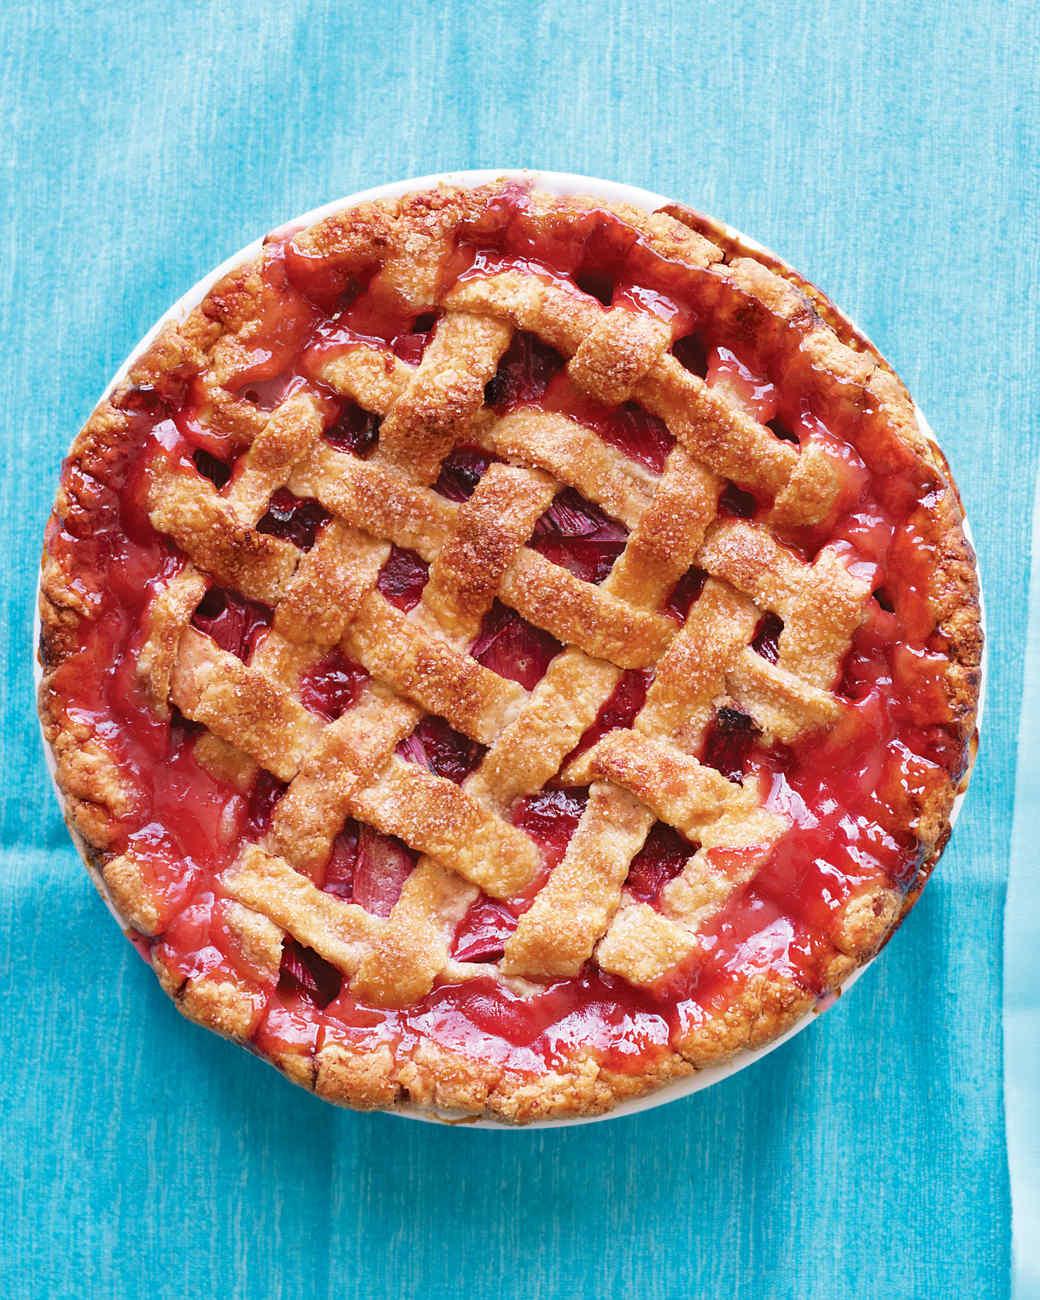 Strawberry Pie: Recipes for Berry Tasty Treats